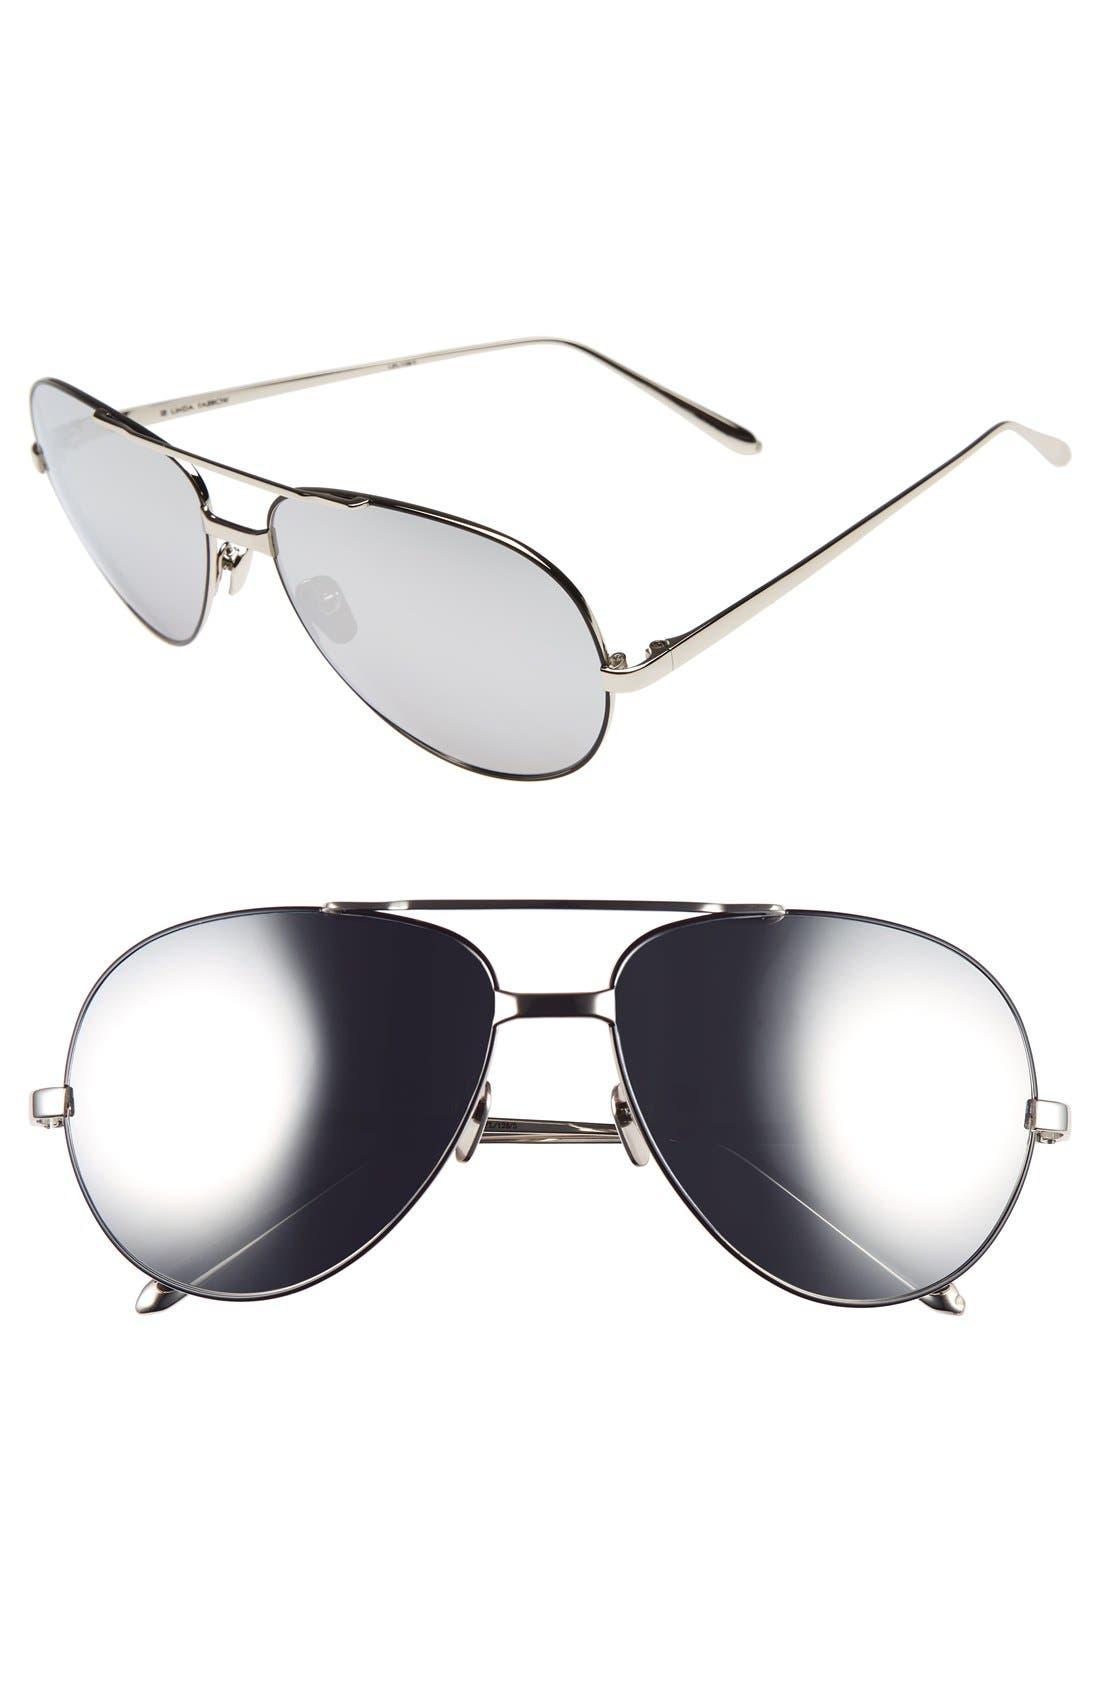 Linda Farrow 59mm 18 Karat White Gold Trim Aviator Sunglasses